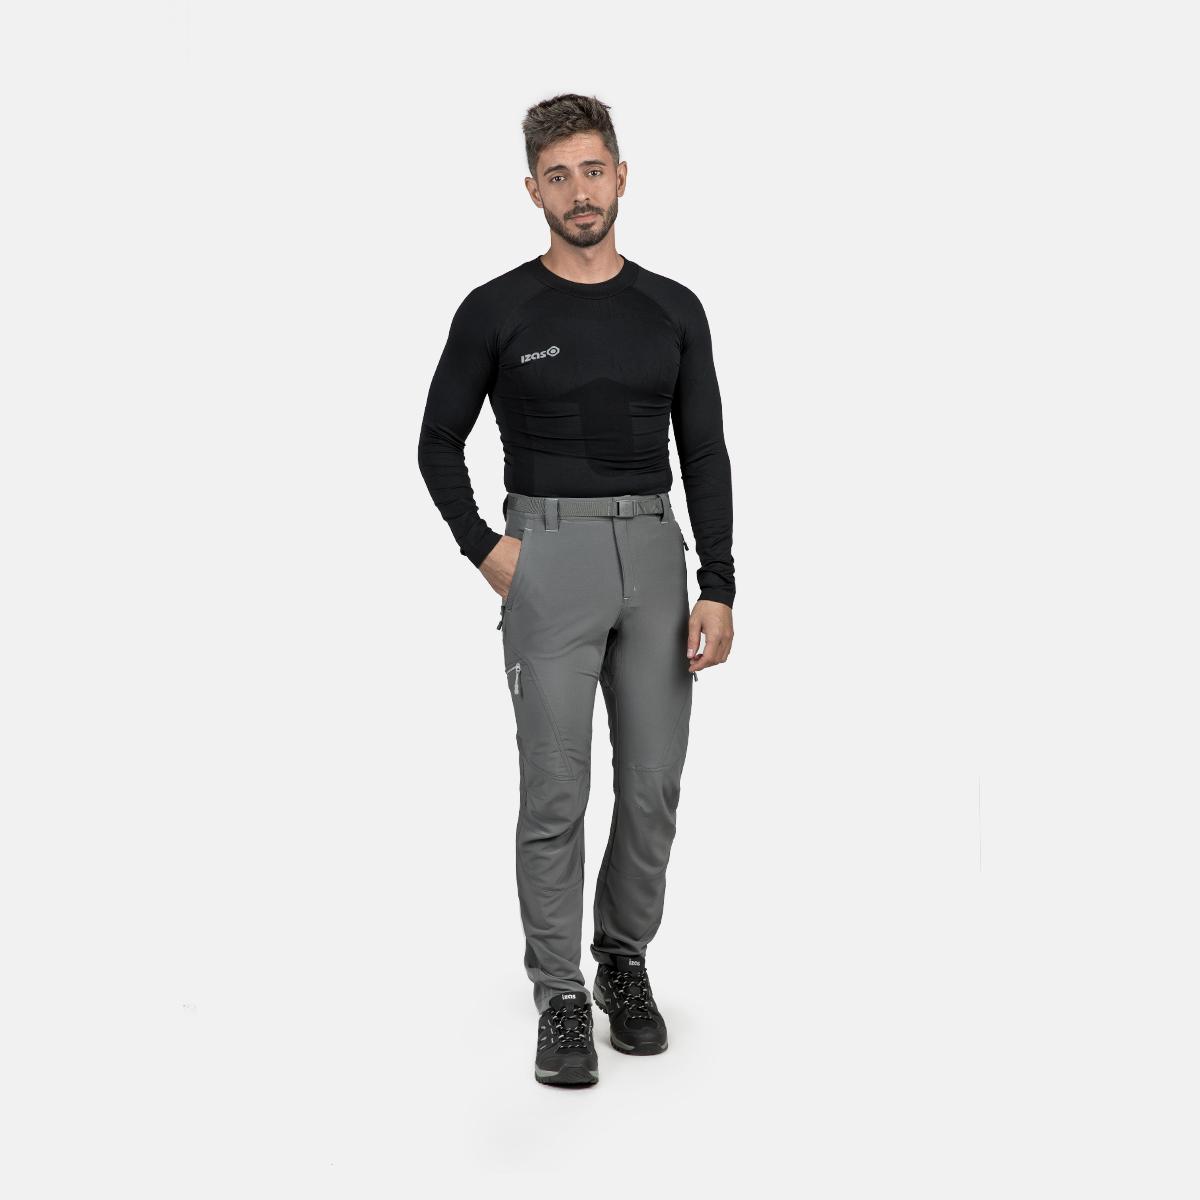 UNISEX'S SAREK THERMAL T-SHIRT BLACK